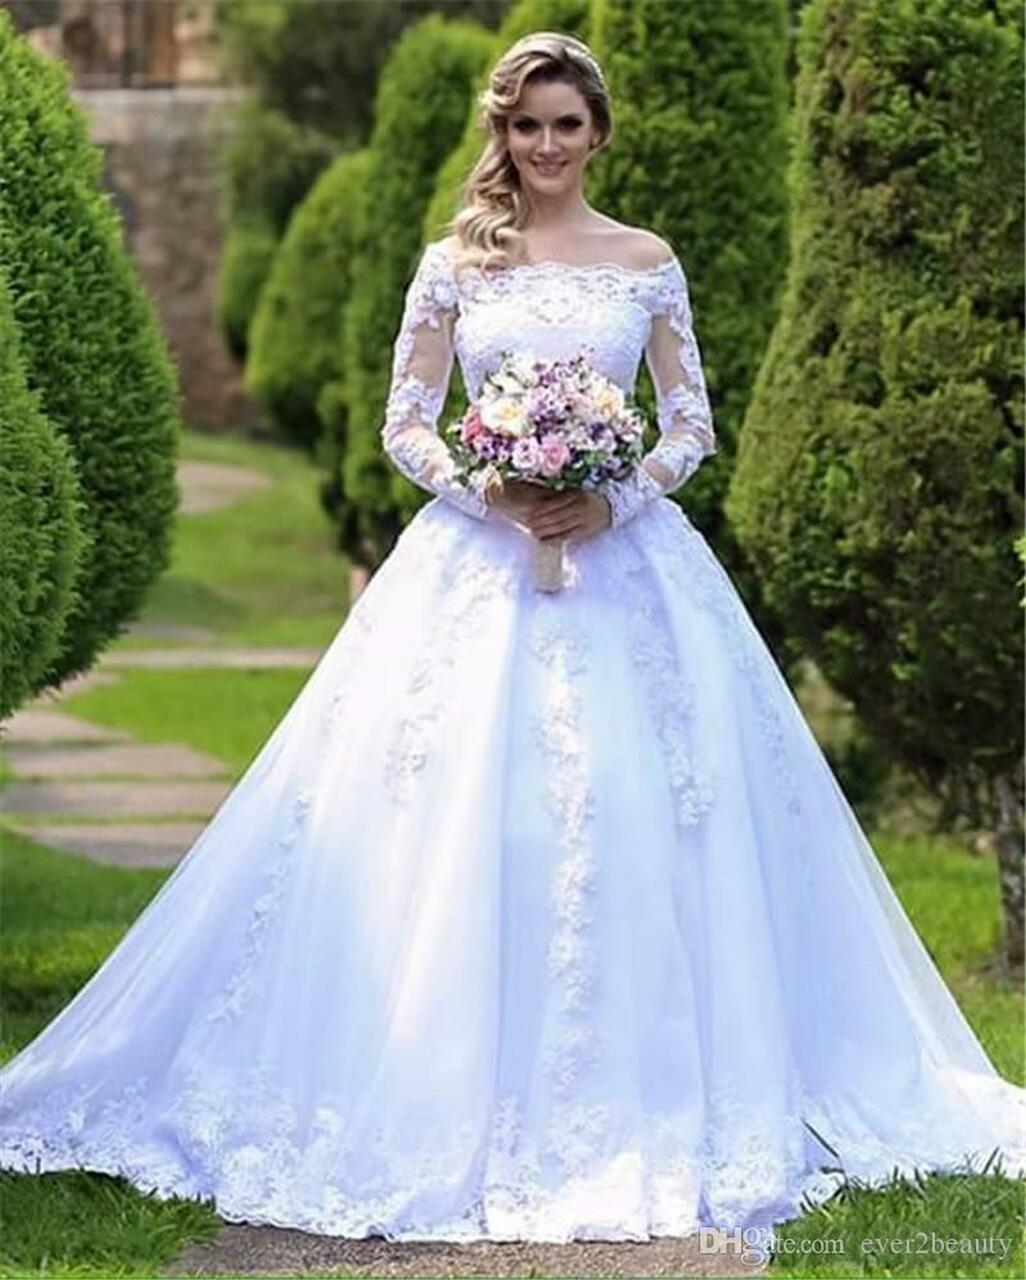 Cheap Wedding Gowns.Cheap Wedding Dresses Lace Vintage Raveitsafe